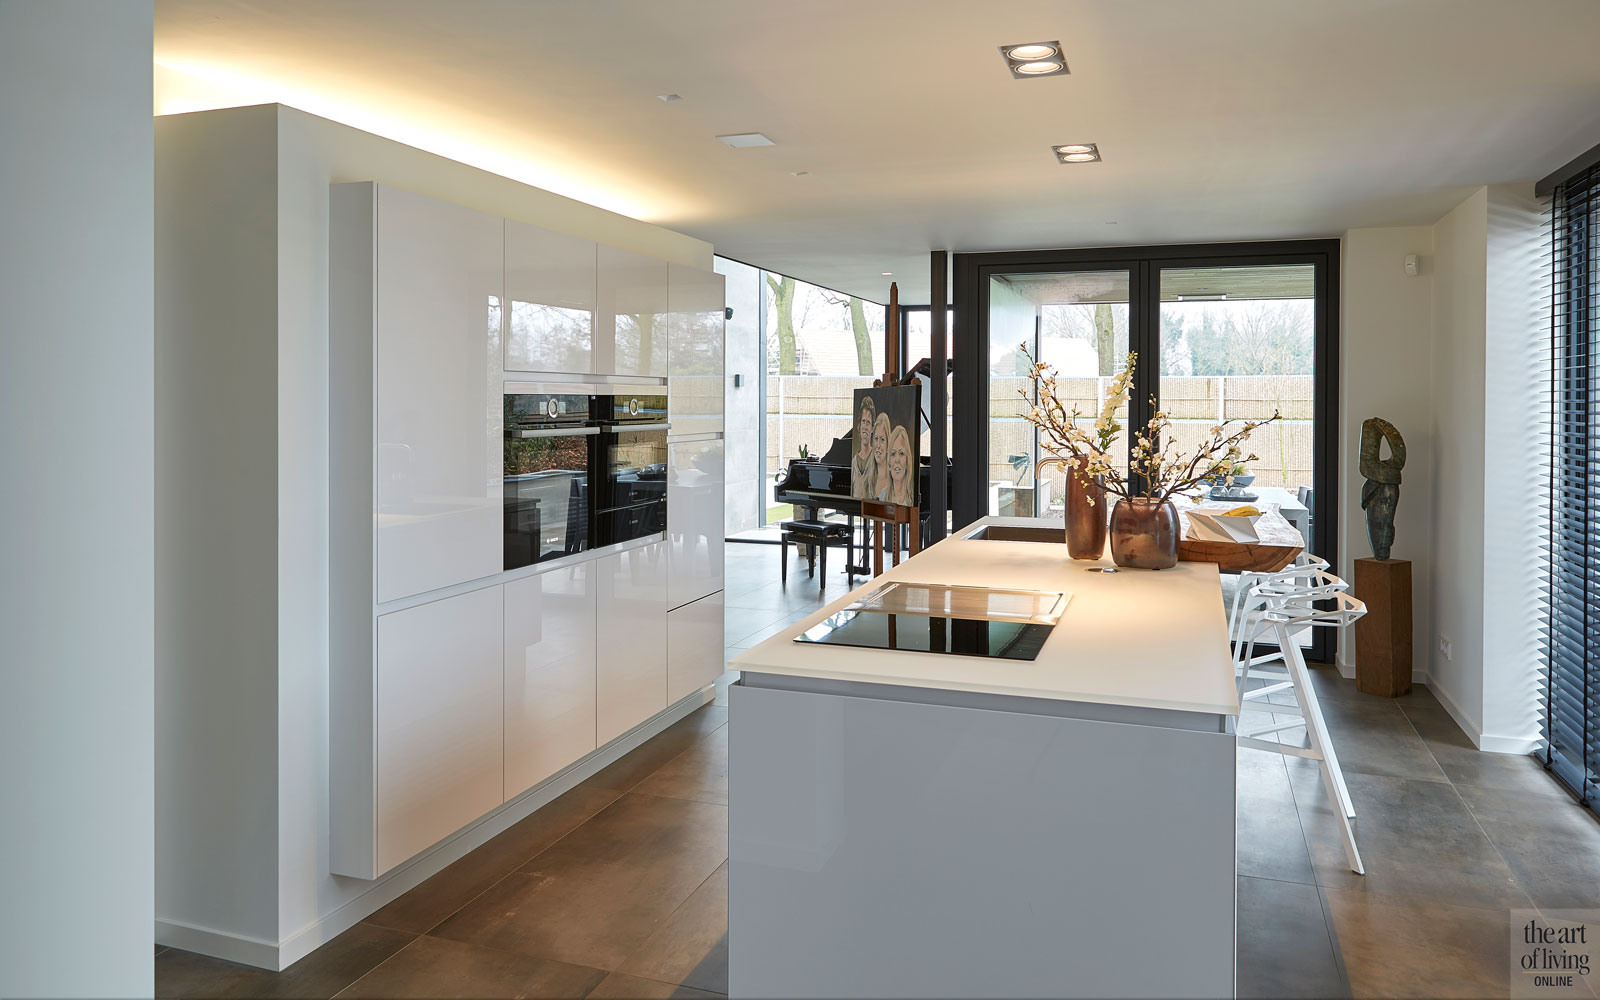 Strakke keuken, Goergen Keukens, leefkeuken, Bora, afzuigsysteem, kookeiland, moderne bungalow, Leenders Architecten en Ingenieurs